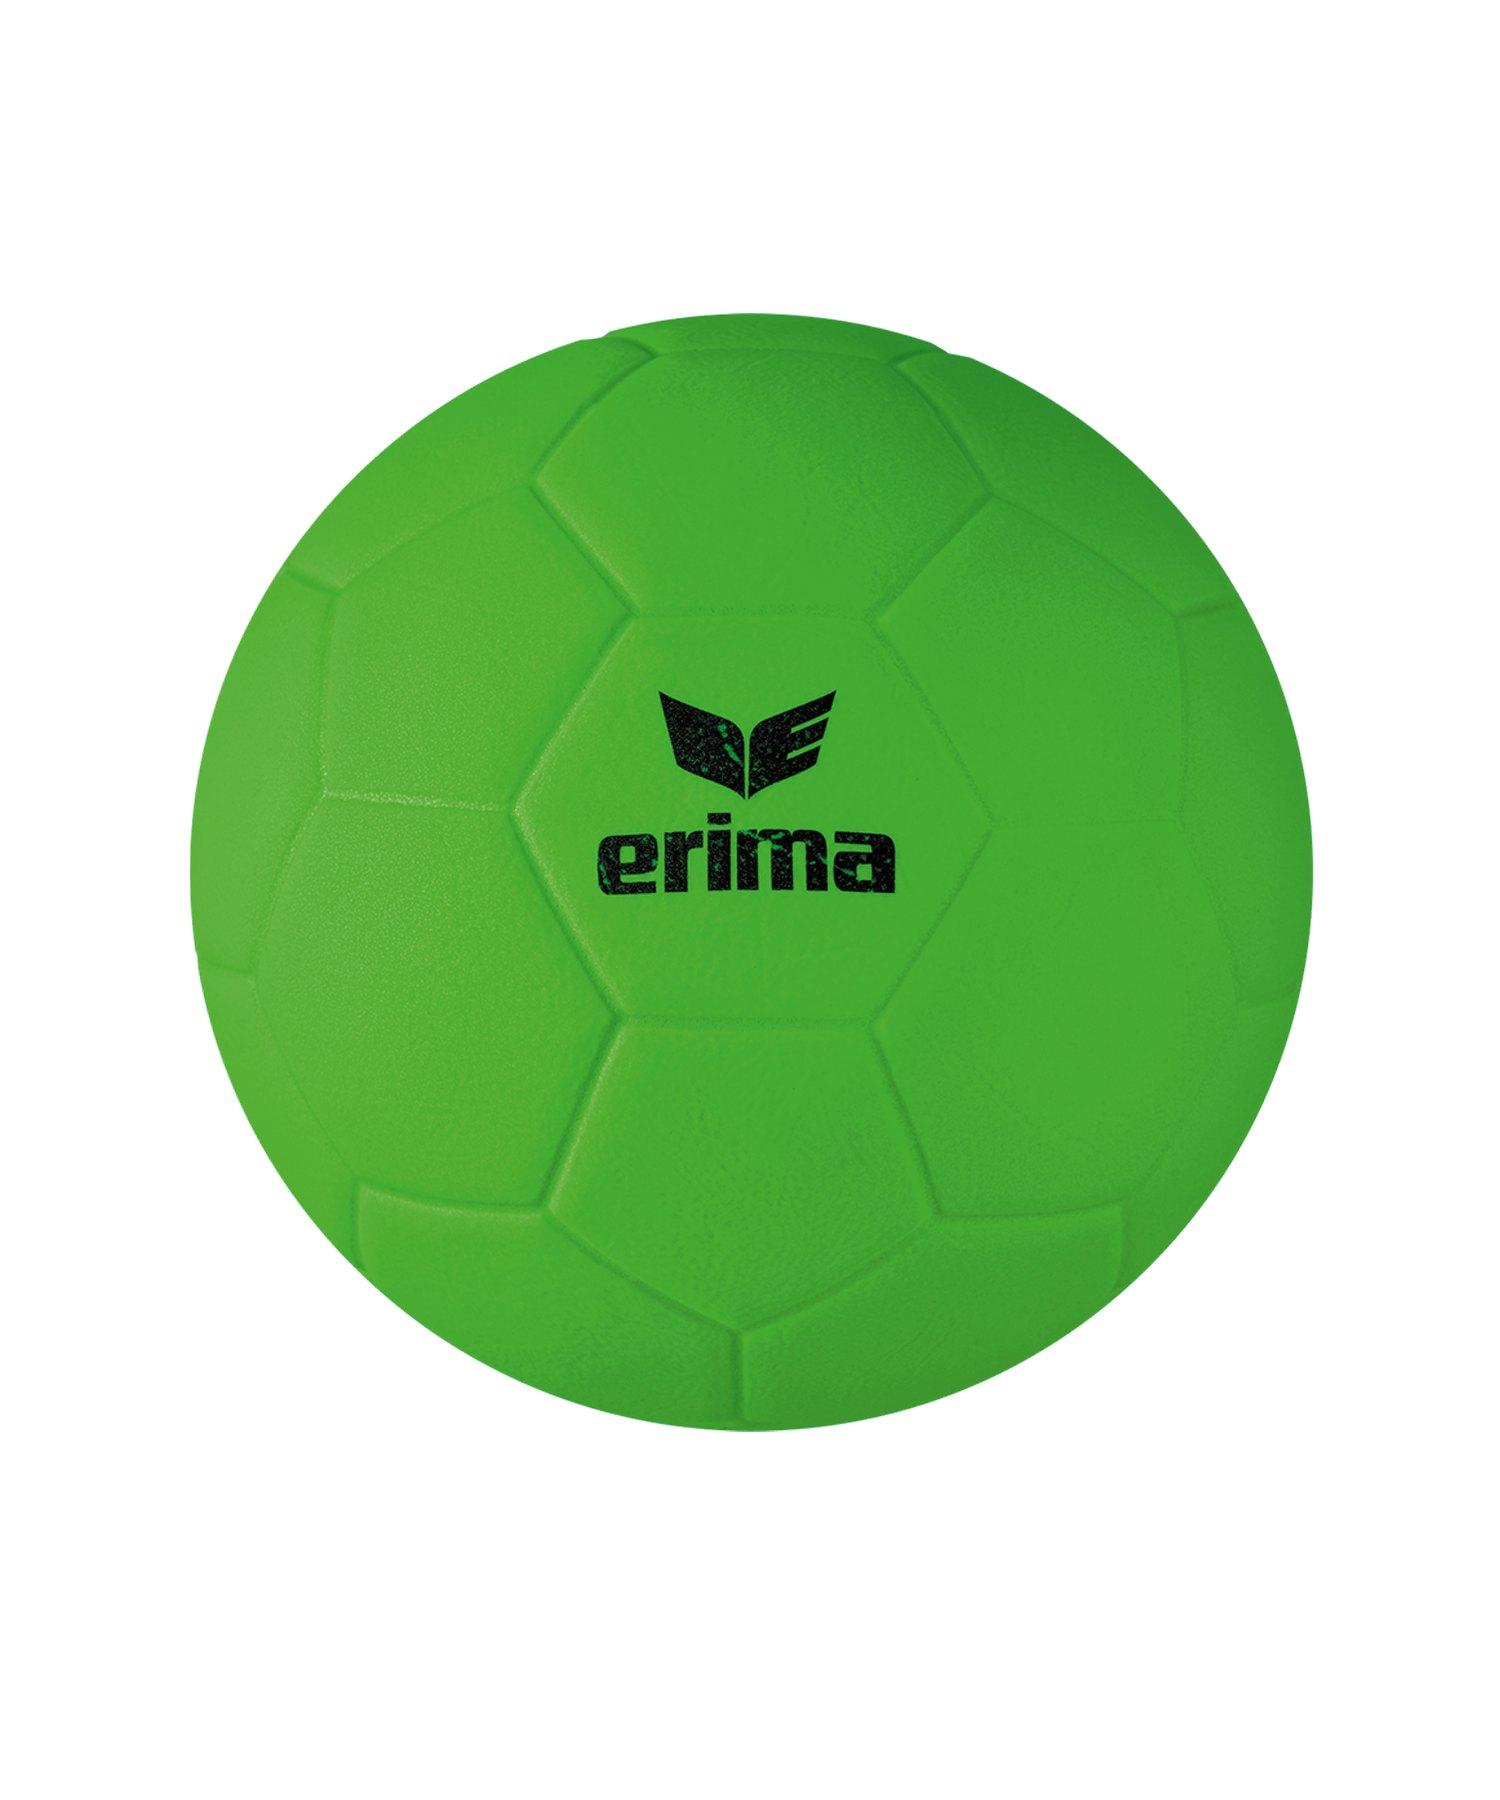 Erima Beachhandball Grün - gruen